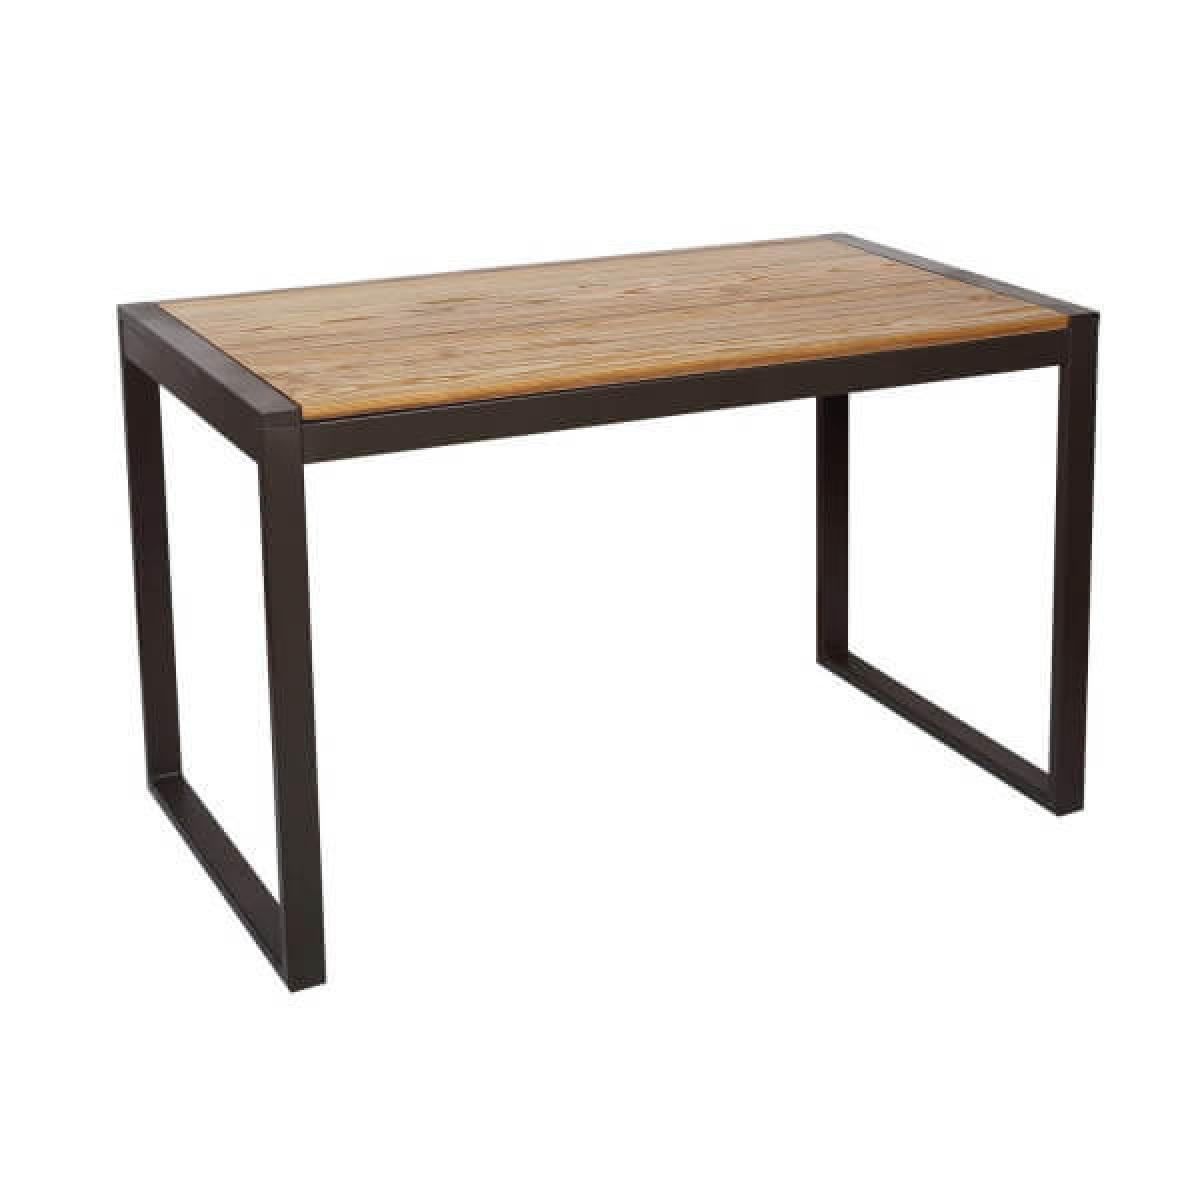 Mathi Design NEVADA - Table repas 120 cm bois massif naturel